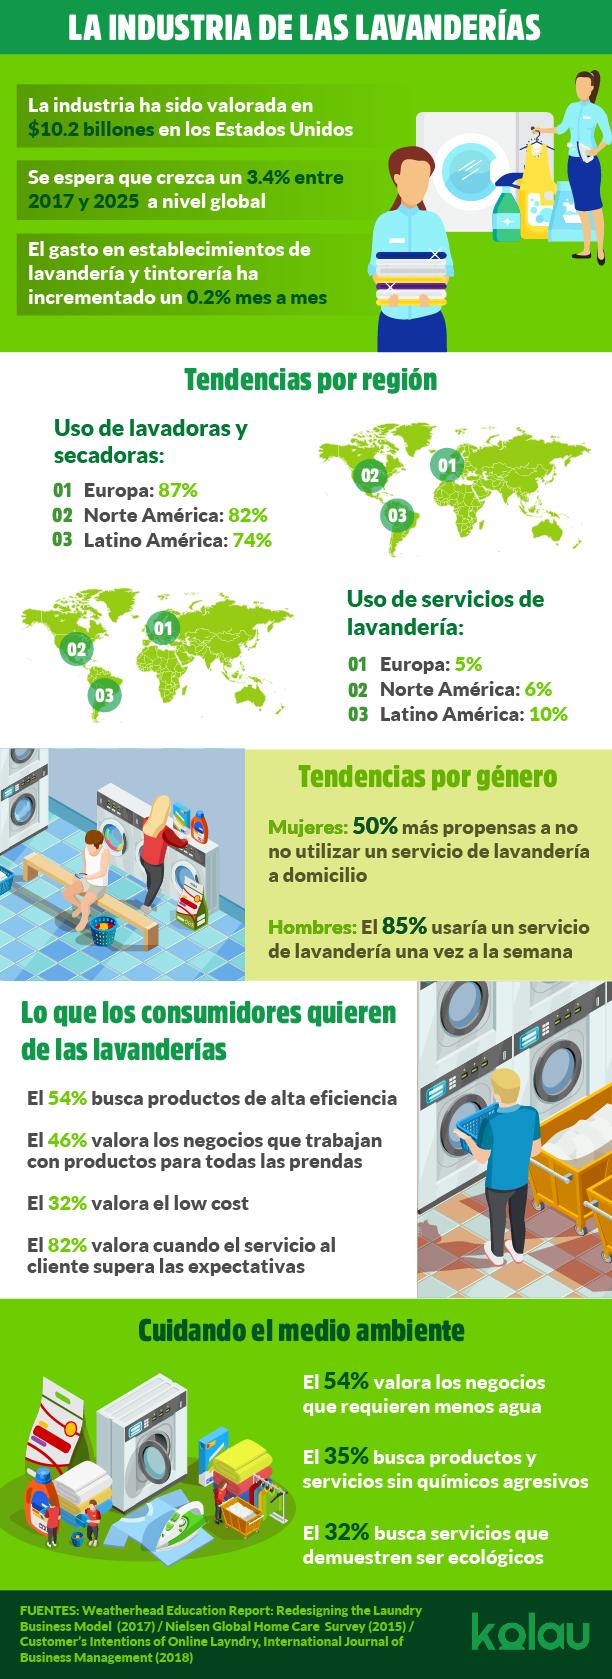 Infografia. Marketing para lavanderías.